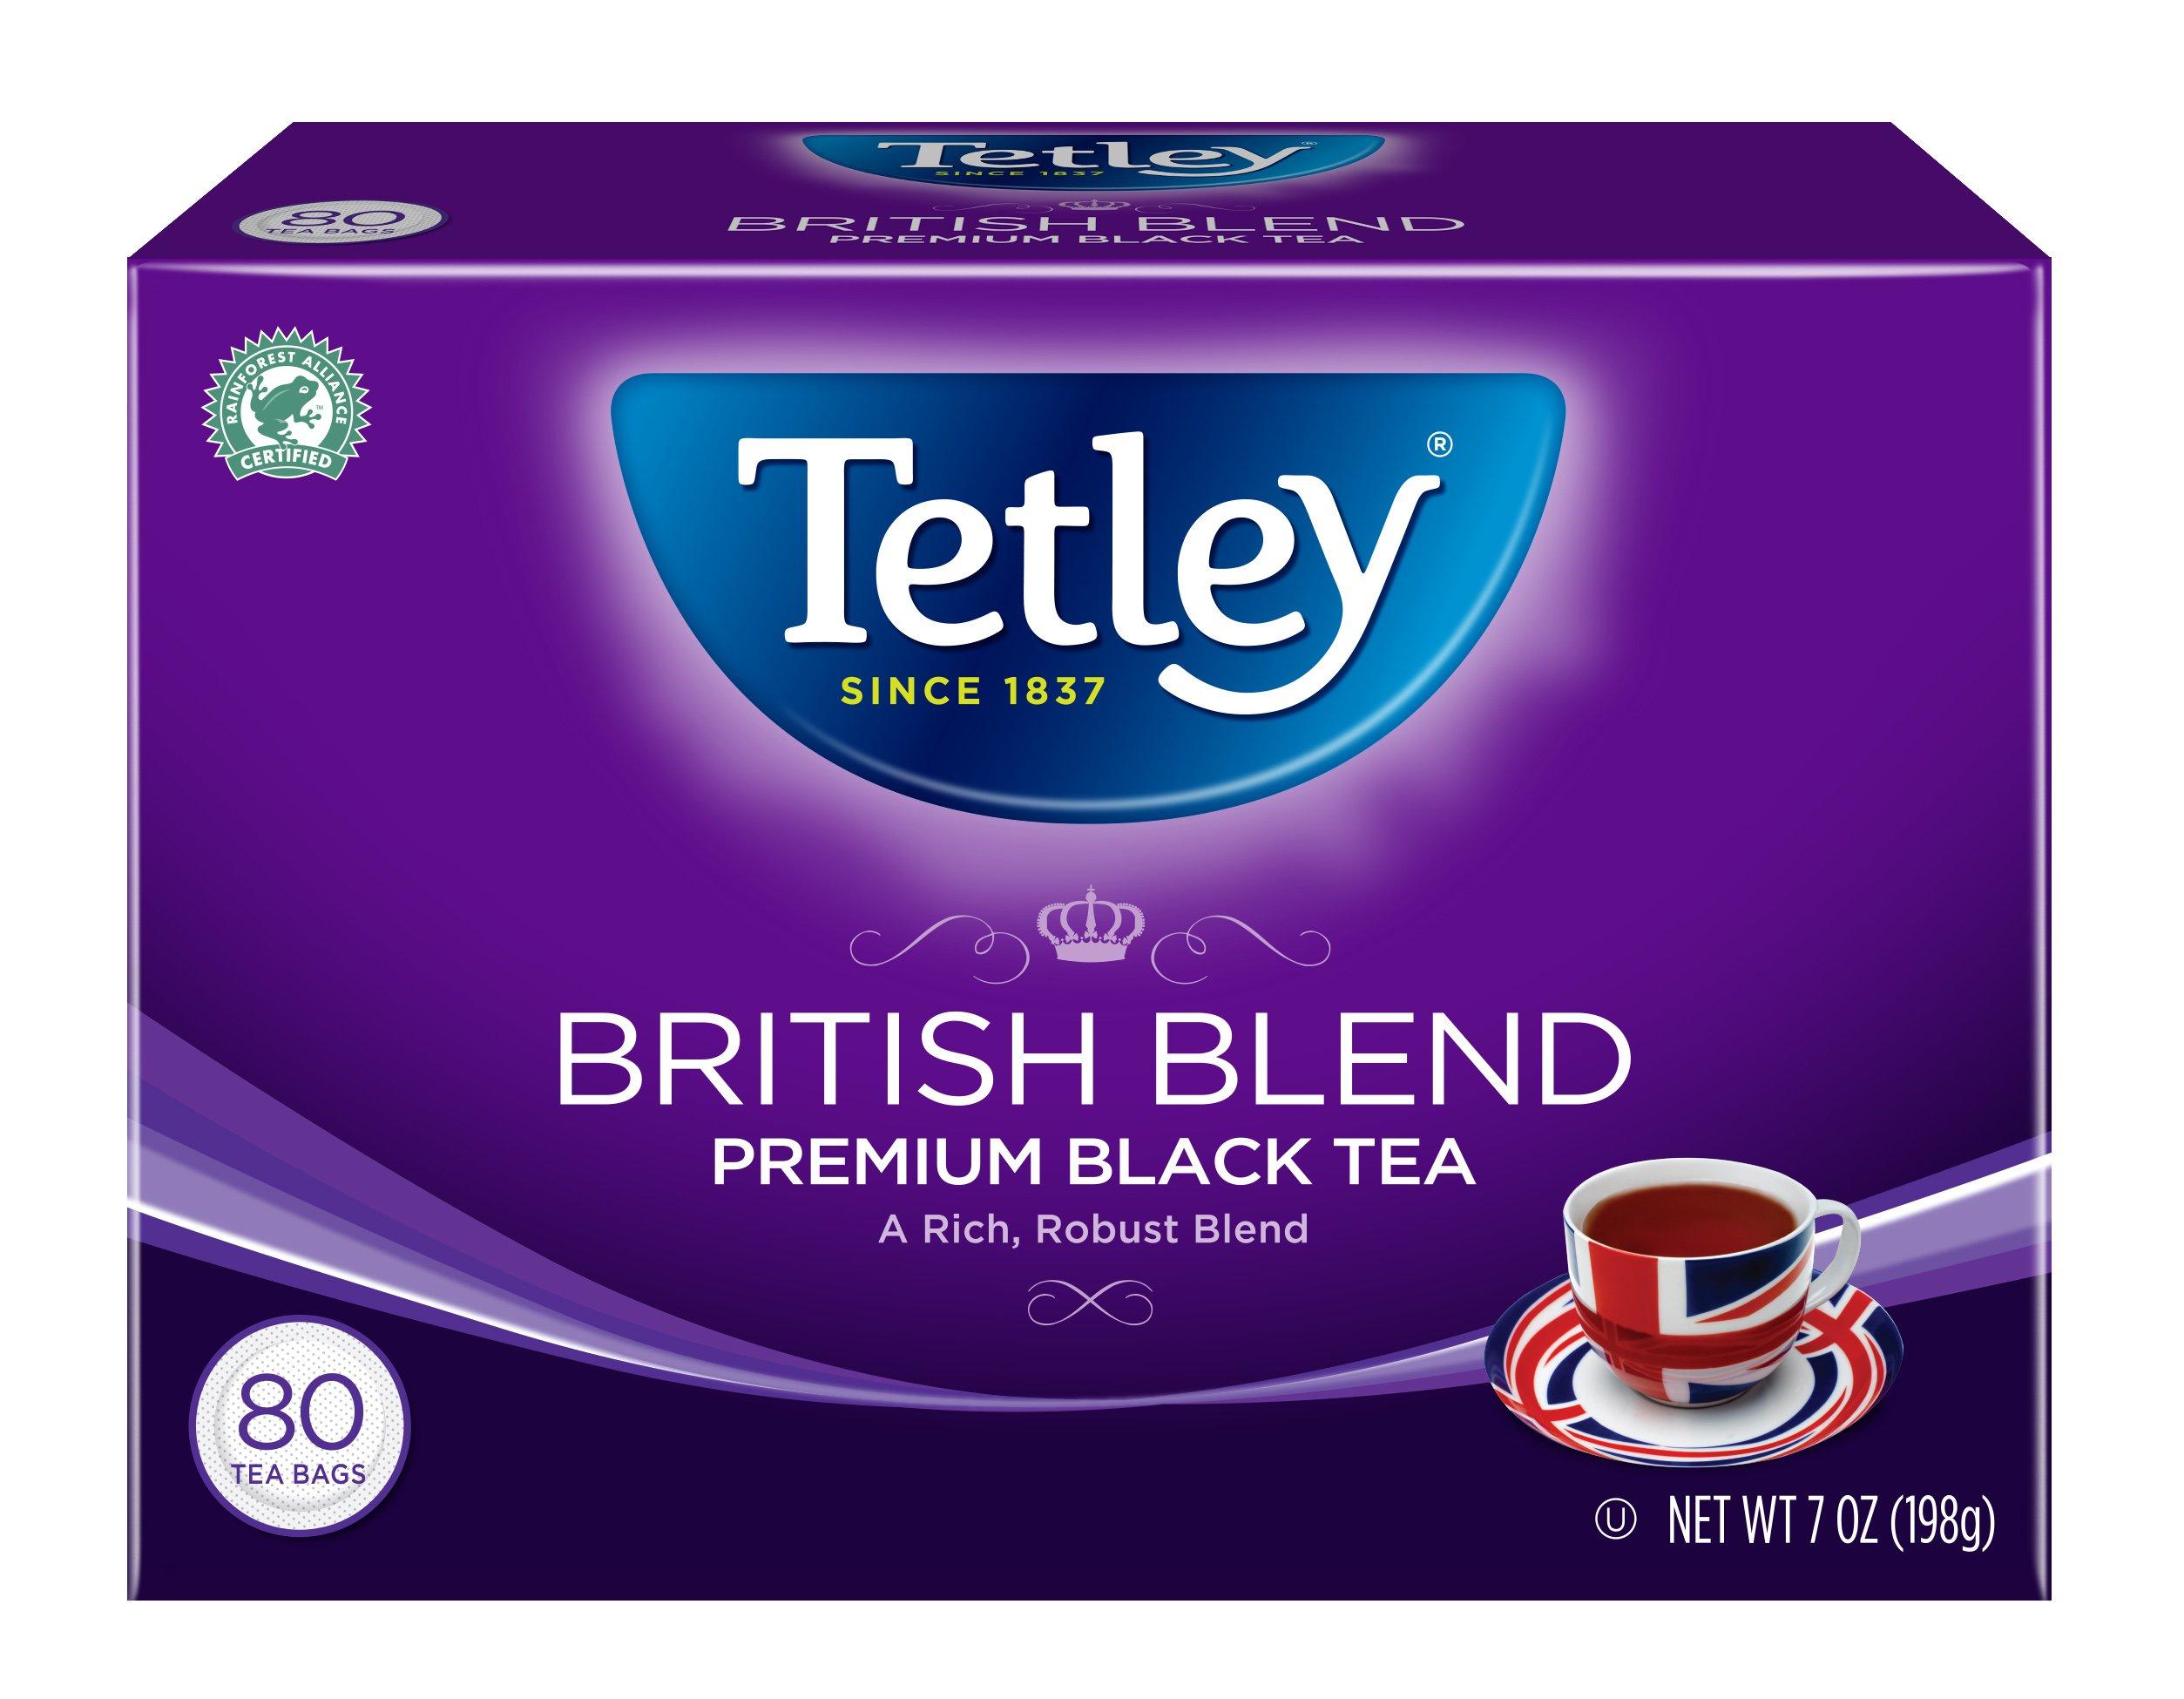 Is Black Tea Naturally Decaffeinated